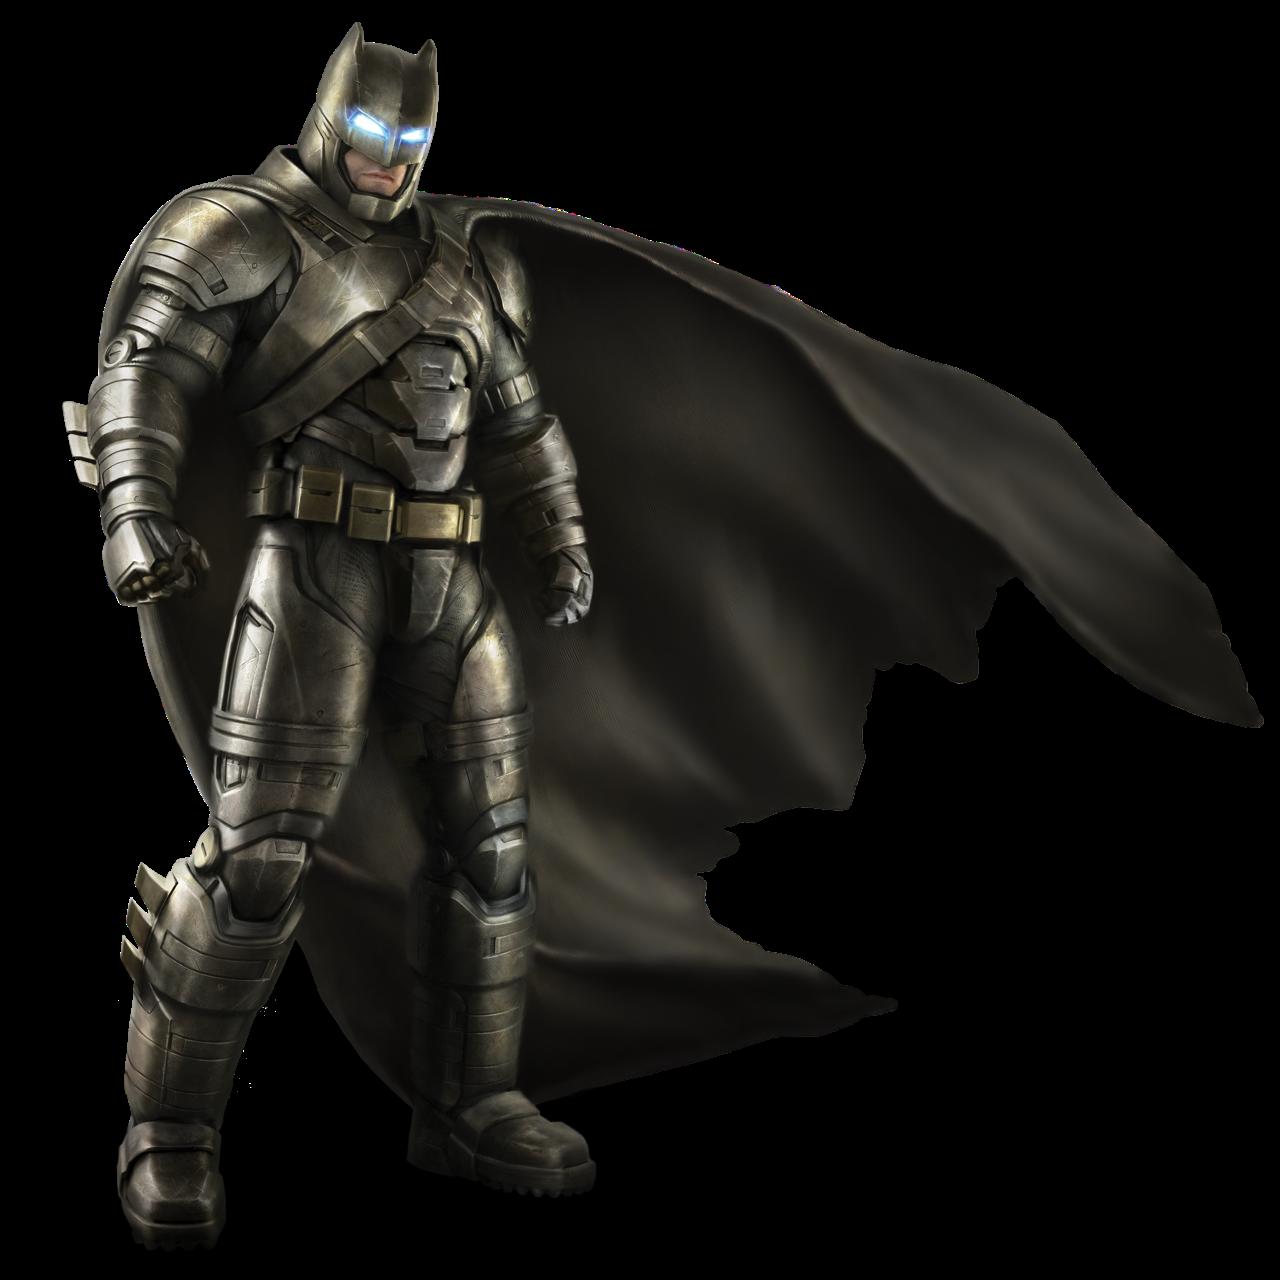 Bat man #Clip #Art. ÅWESOMENESS!!!™ ÅÅÅ+.